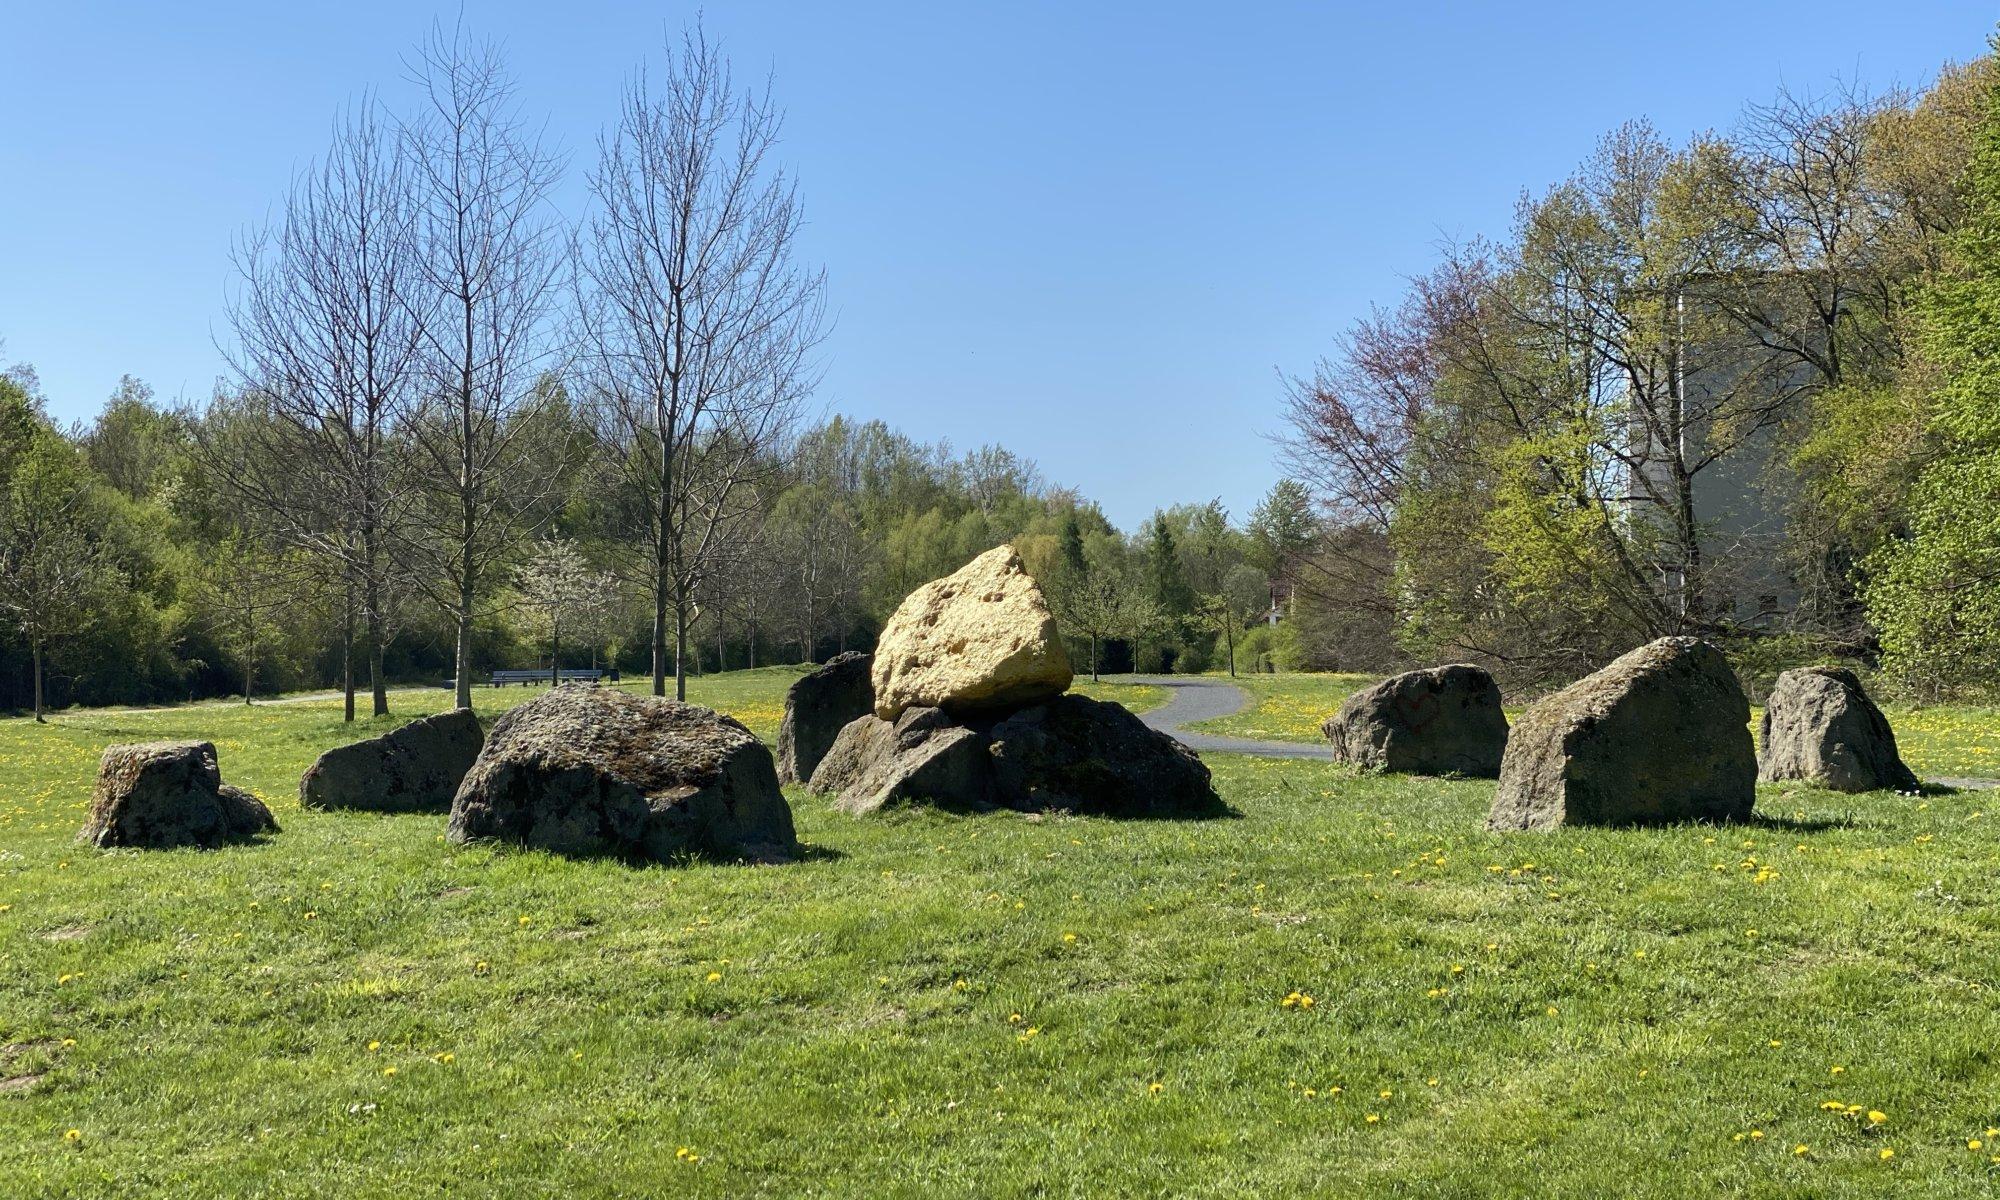 Dorothea-Viehmann-Park, Kassel